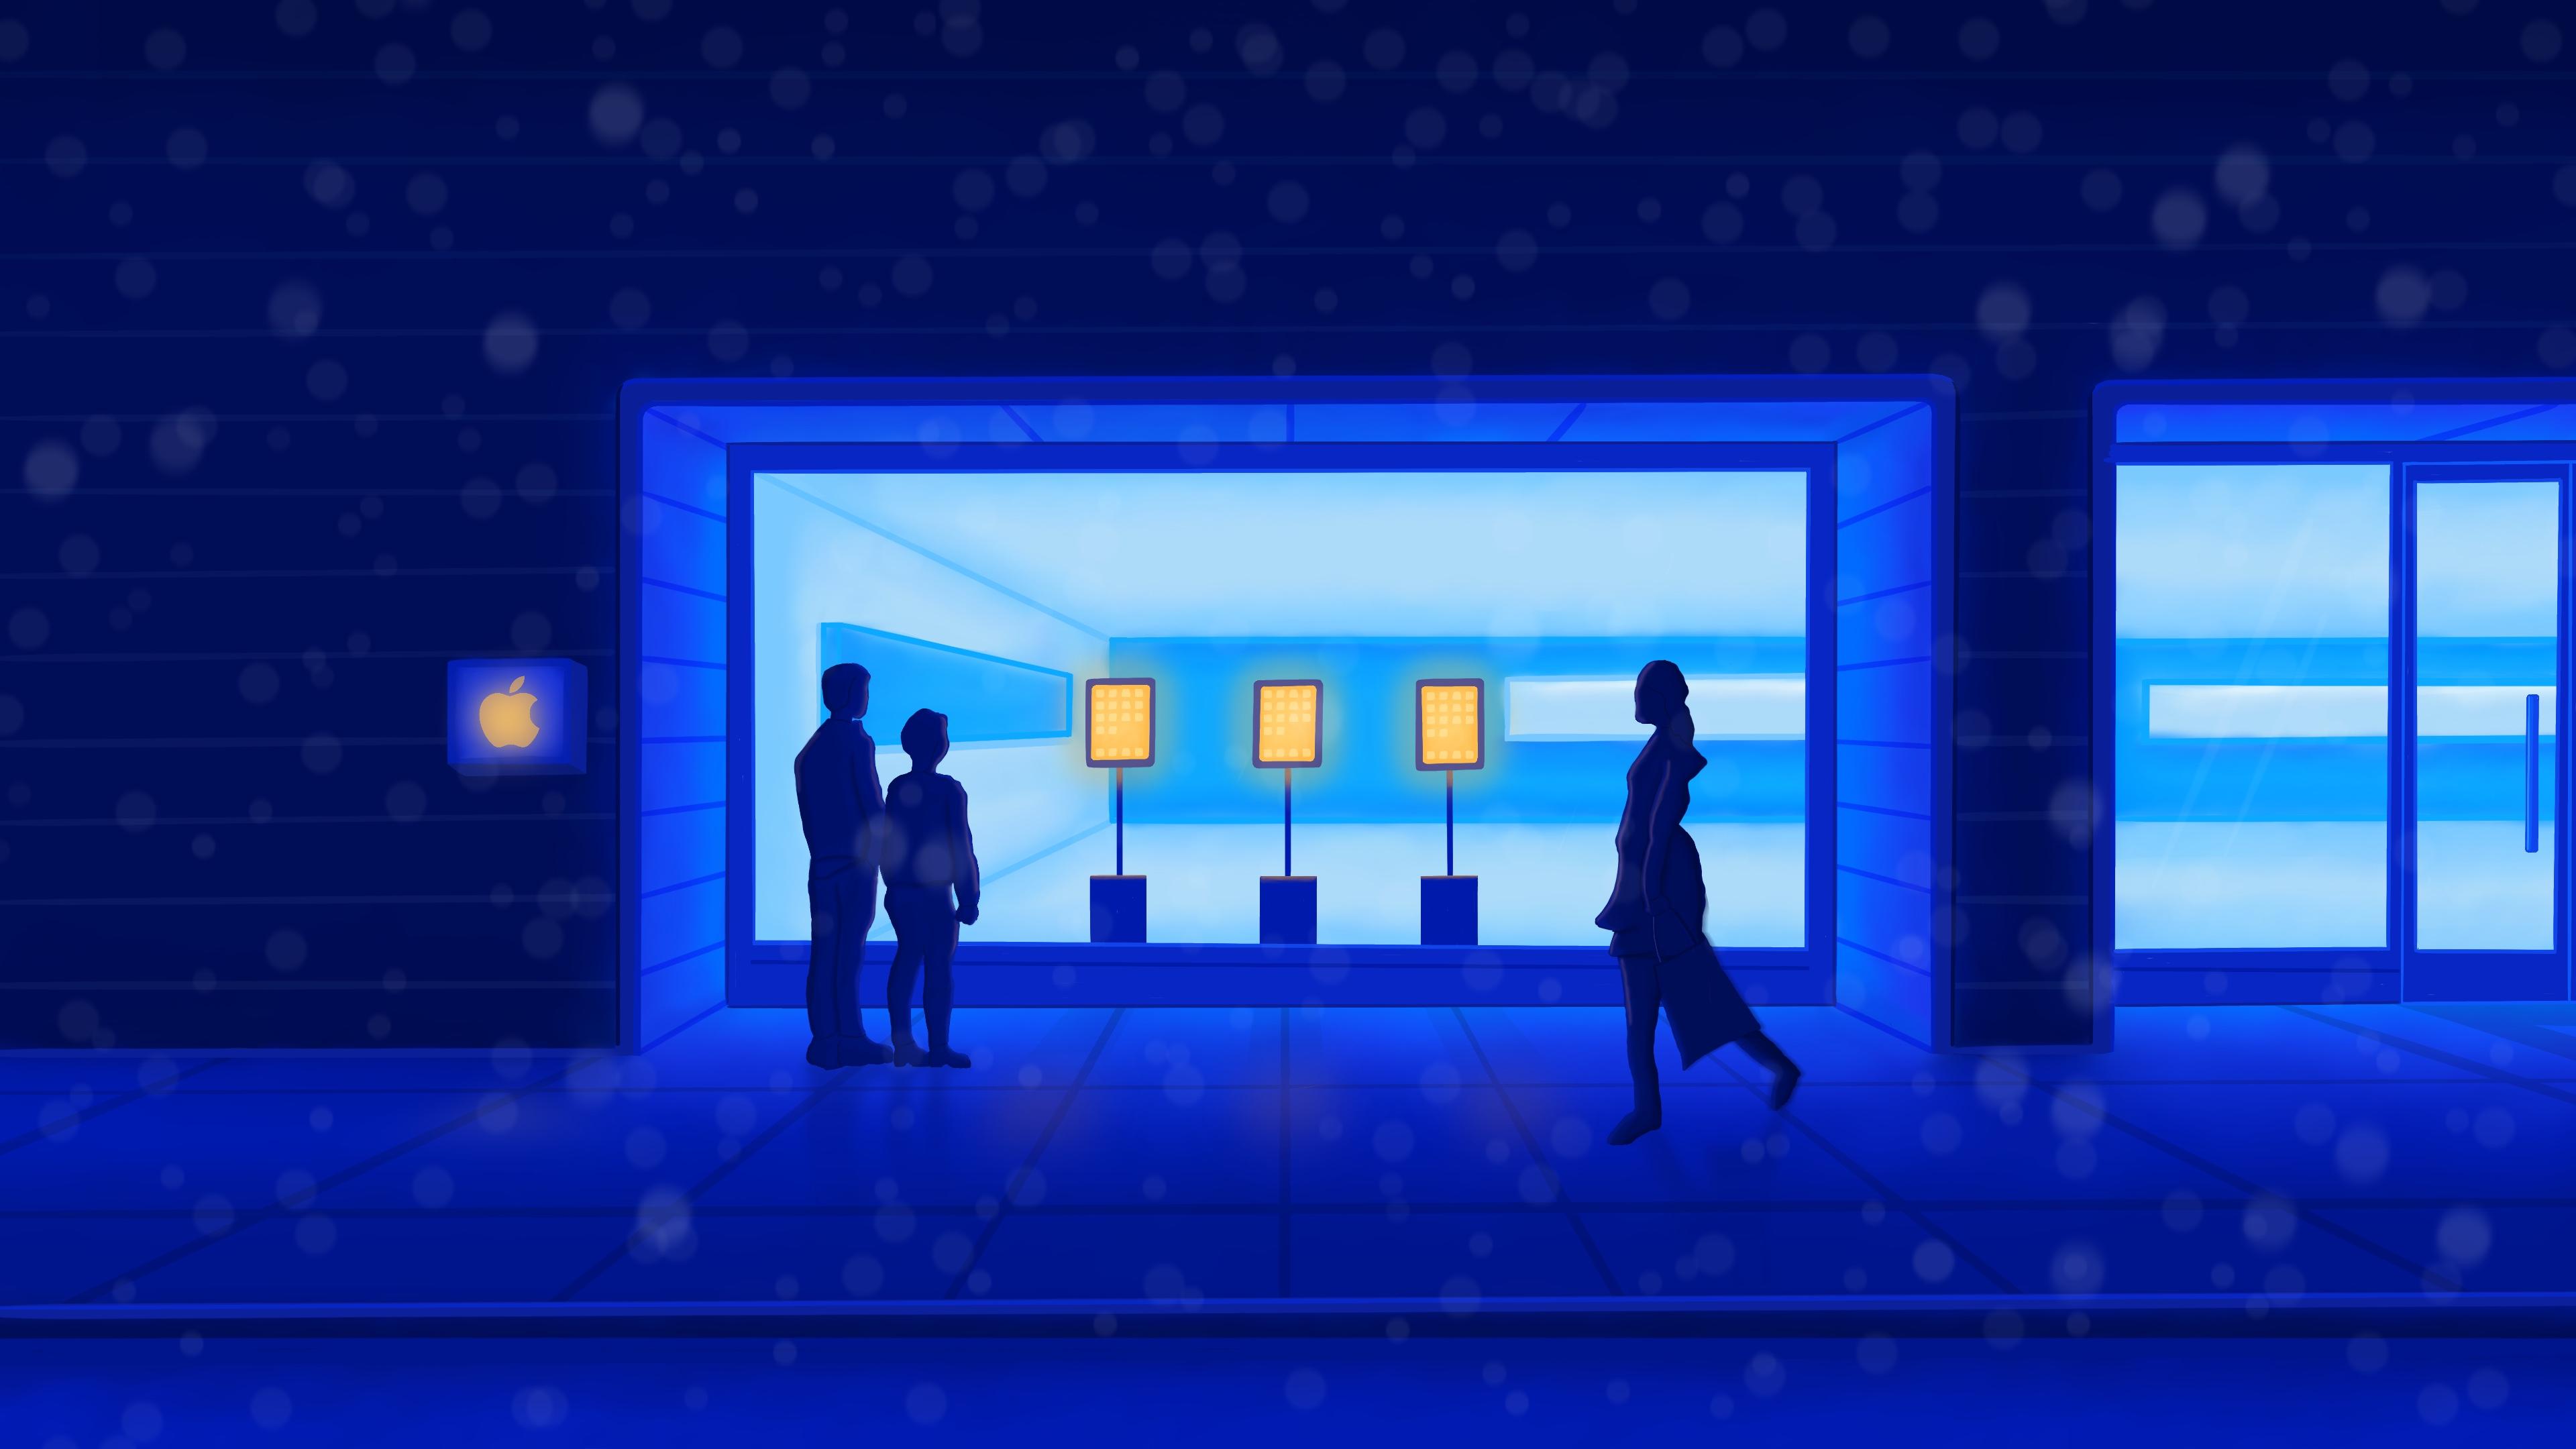 Winter wonderland: Apple's holiday window displays through the years